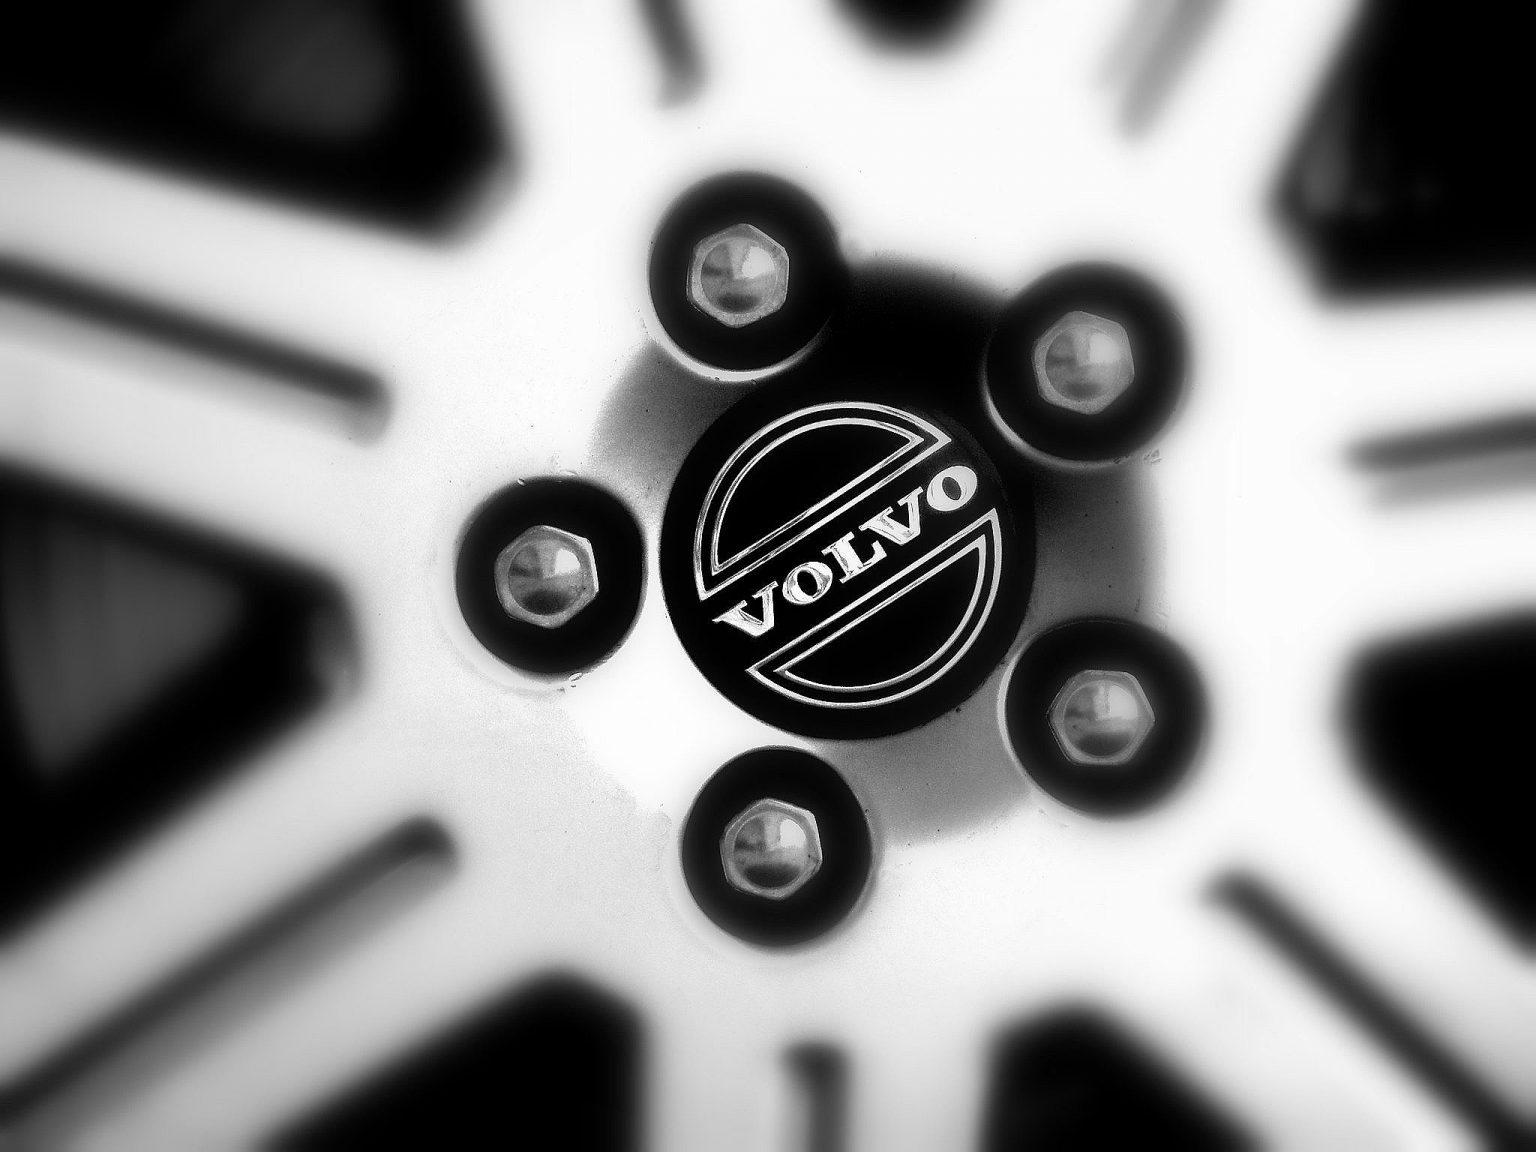 Volvo-wheel-close-up-Popular Mechanix-San-Francisco-auto-car-repair-service.jpg